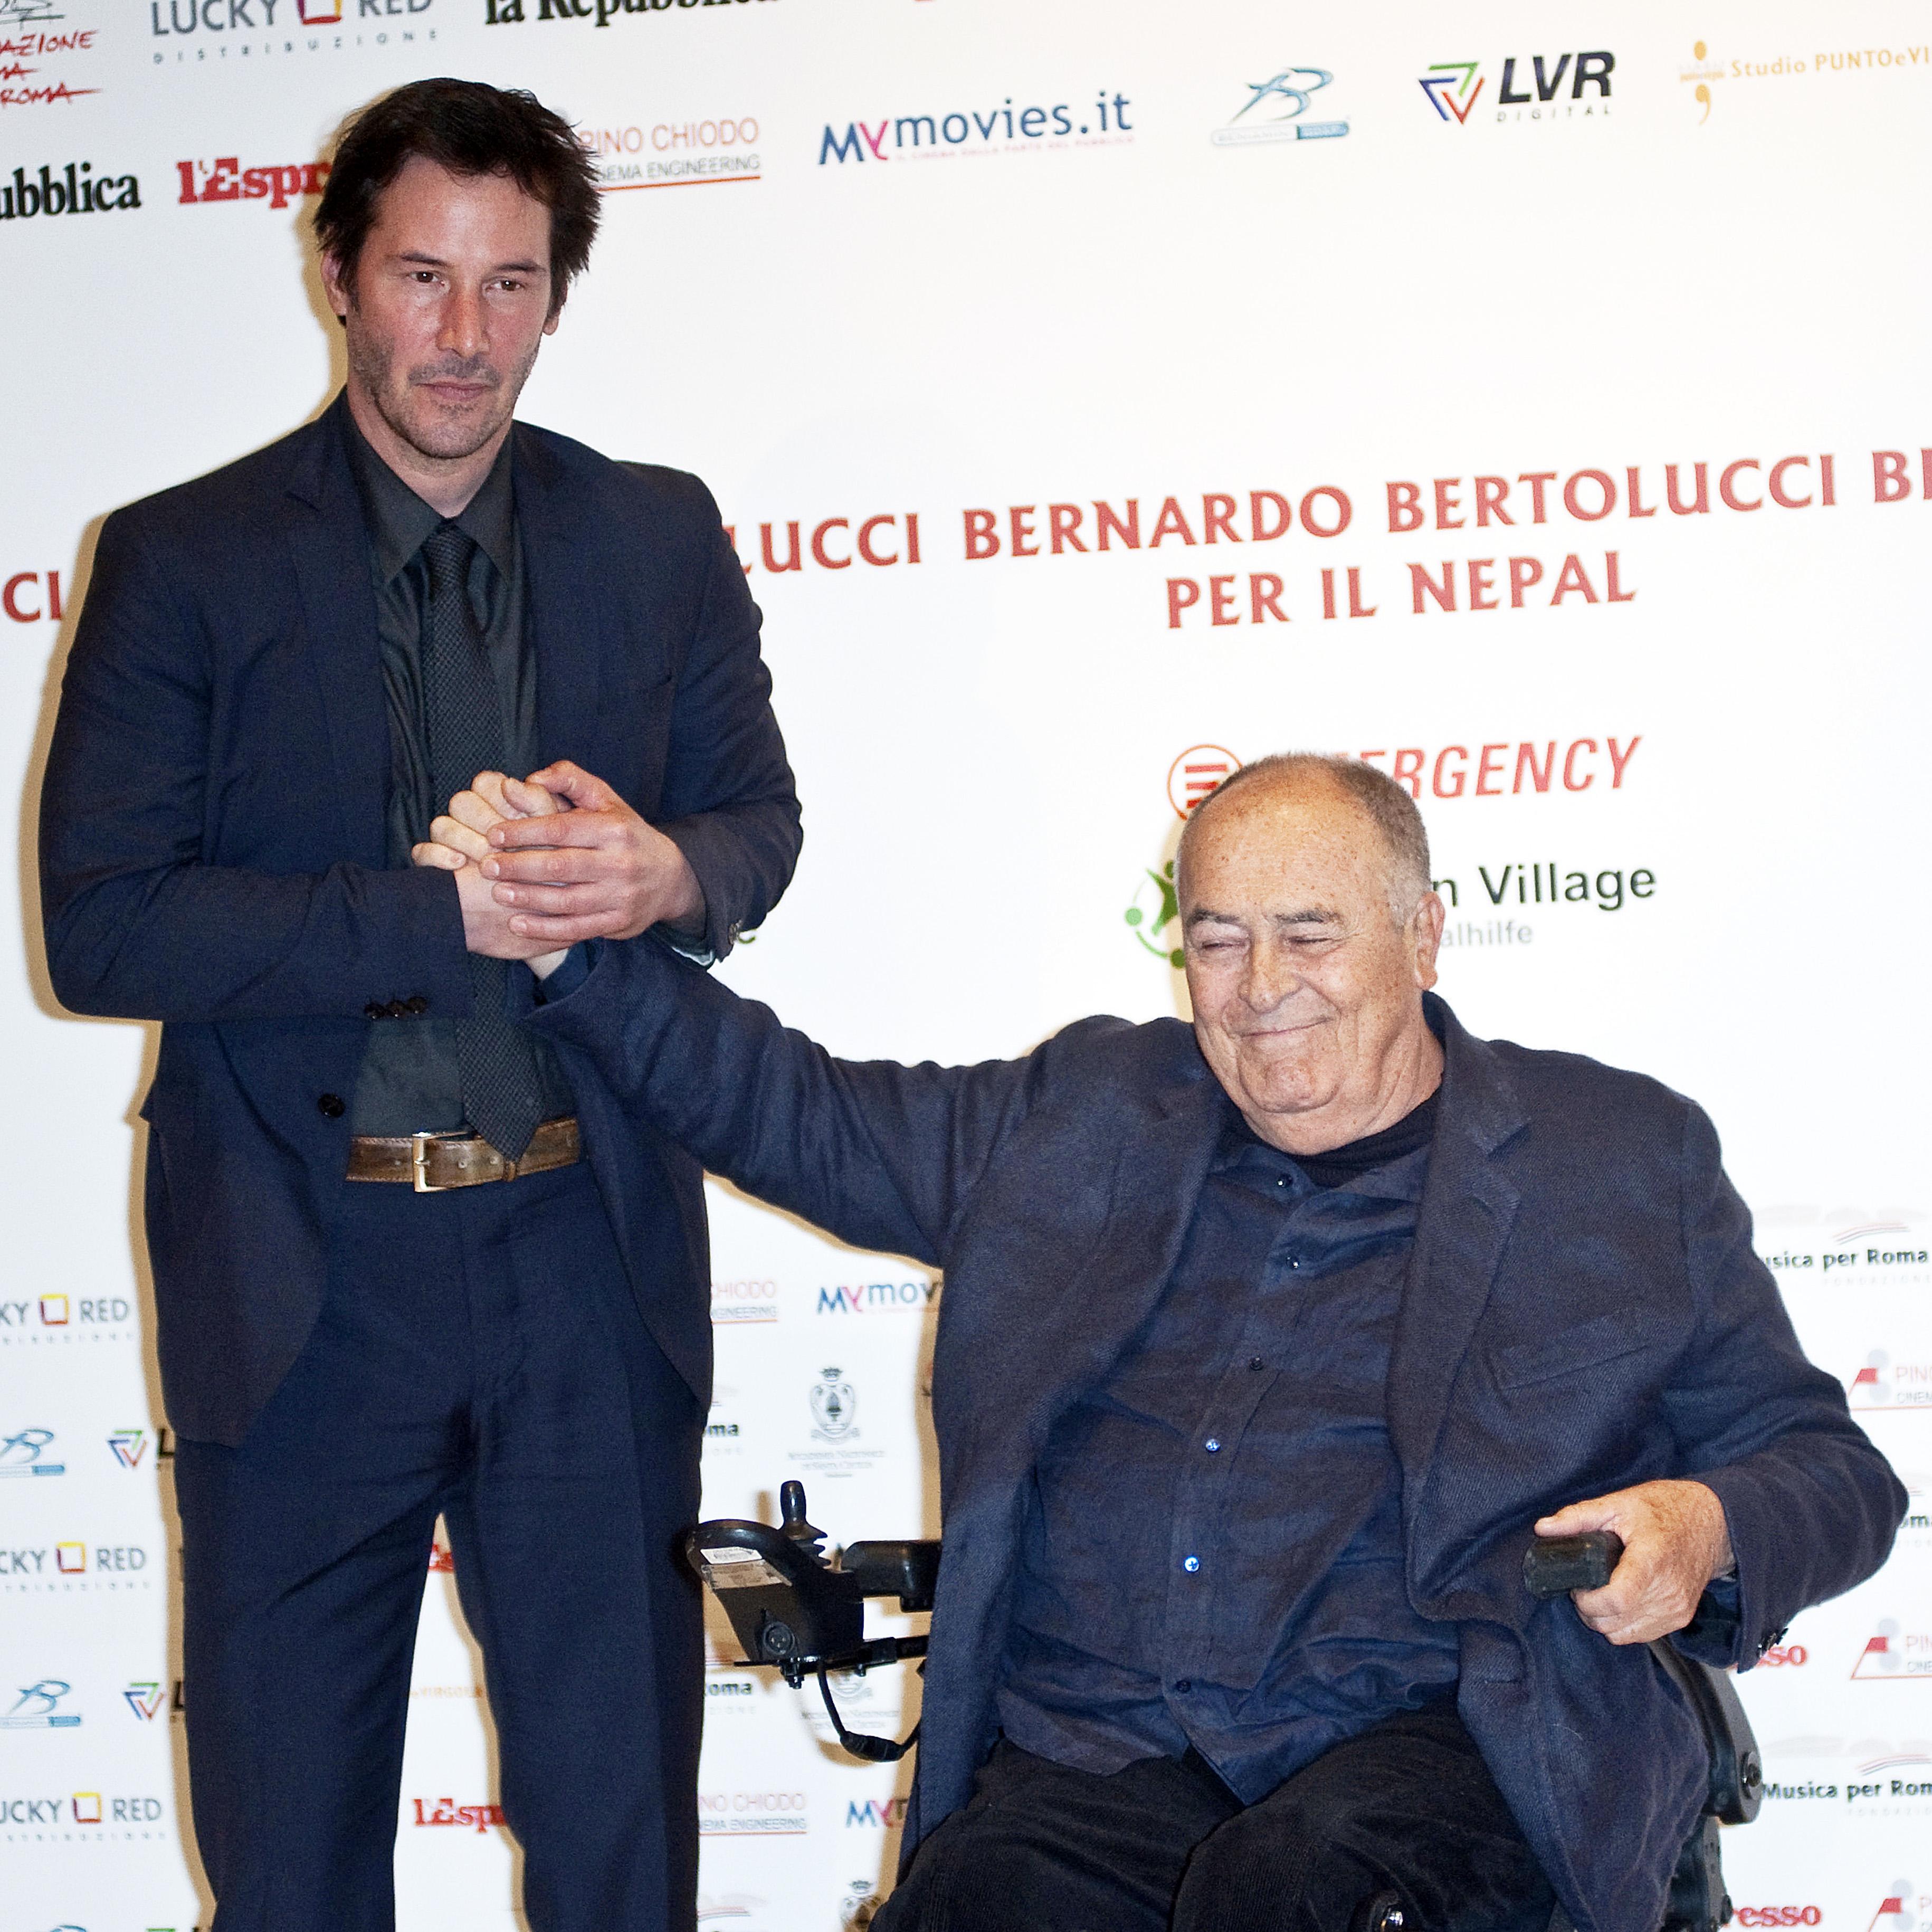 Zmarł reżyser Bernardo Bertolucci, autor Ostatniego cesarza